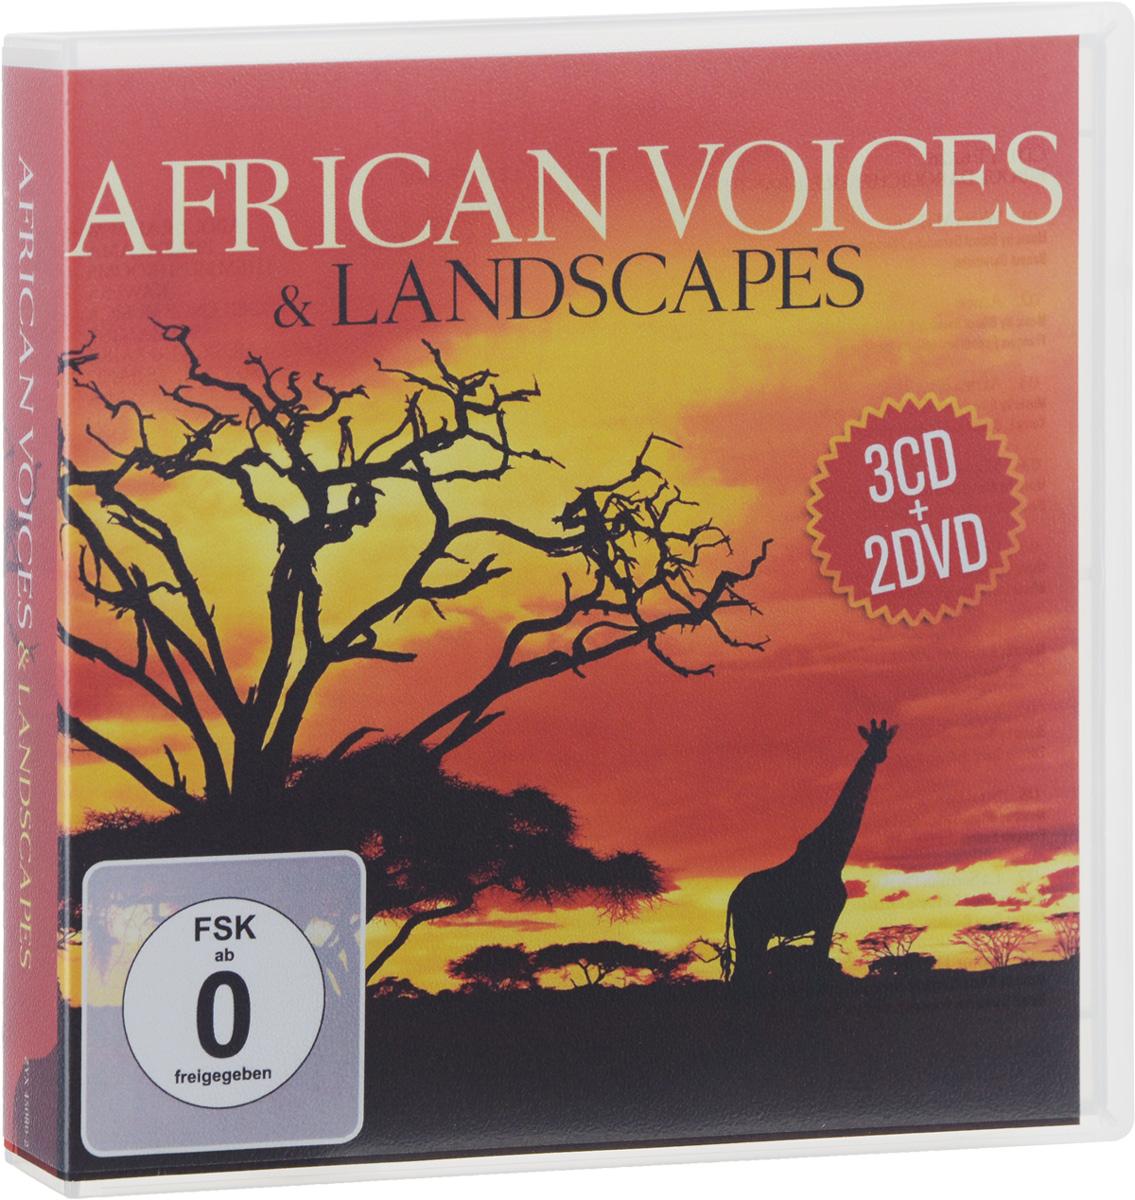 цена на Biboul Darouiche,Abdul Raheem,Bin-Kalama,Them Mushrooms,Kawesa,Lesasa,Bilenge Musica,Nii Mantse,The Magazines Band,Tshisungo Kalomba,Waves Band,Kassala,Achieng Abura,Albert Shehi,Ali Com,Ali Mwaligulu,Ангела Чибалонза,Diamond Stars,Gidi Gidi Majimaji,Jackey Malle,Джей Ди,Jemmimah Thiongo African Voices & Landscapes (3 CD + 2 DVD)